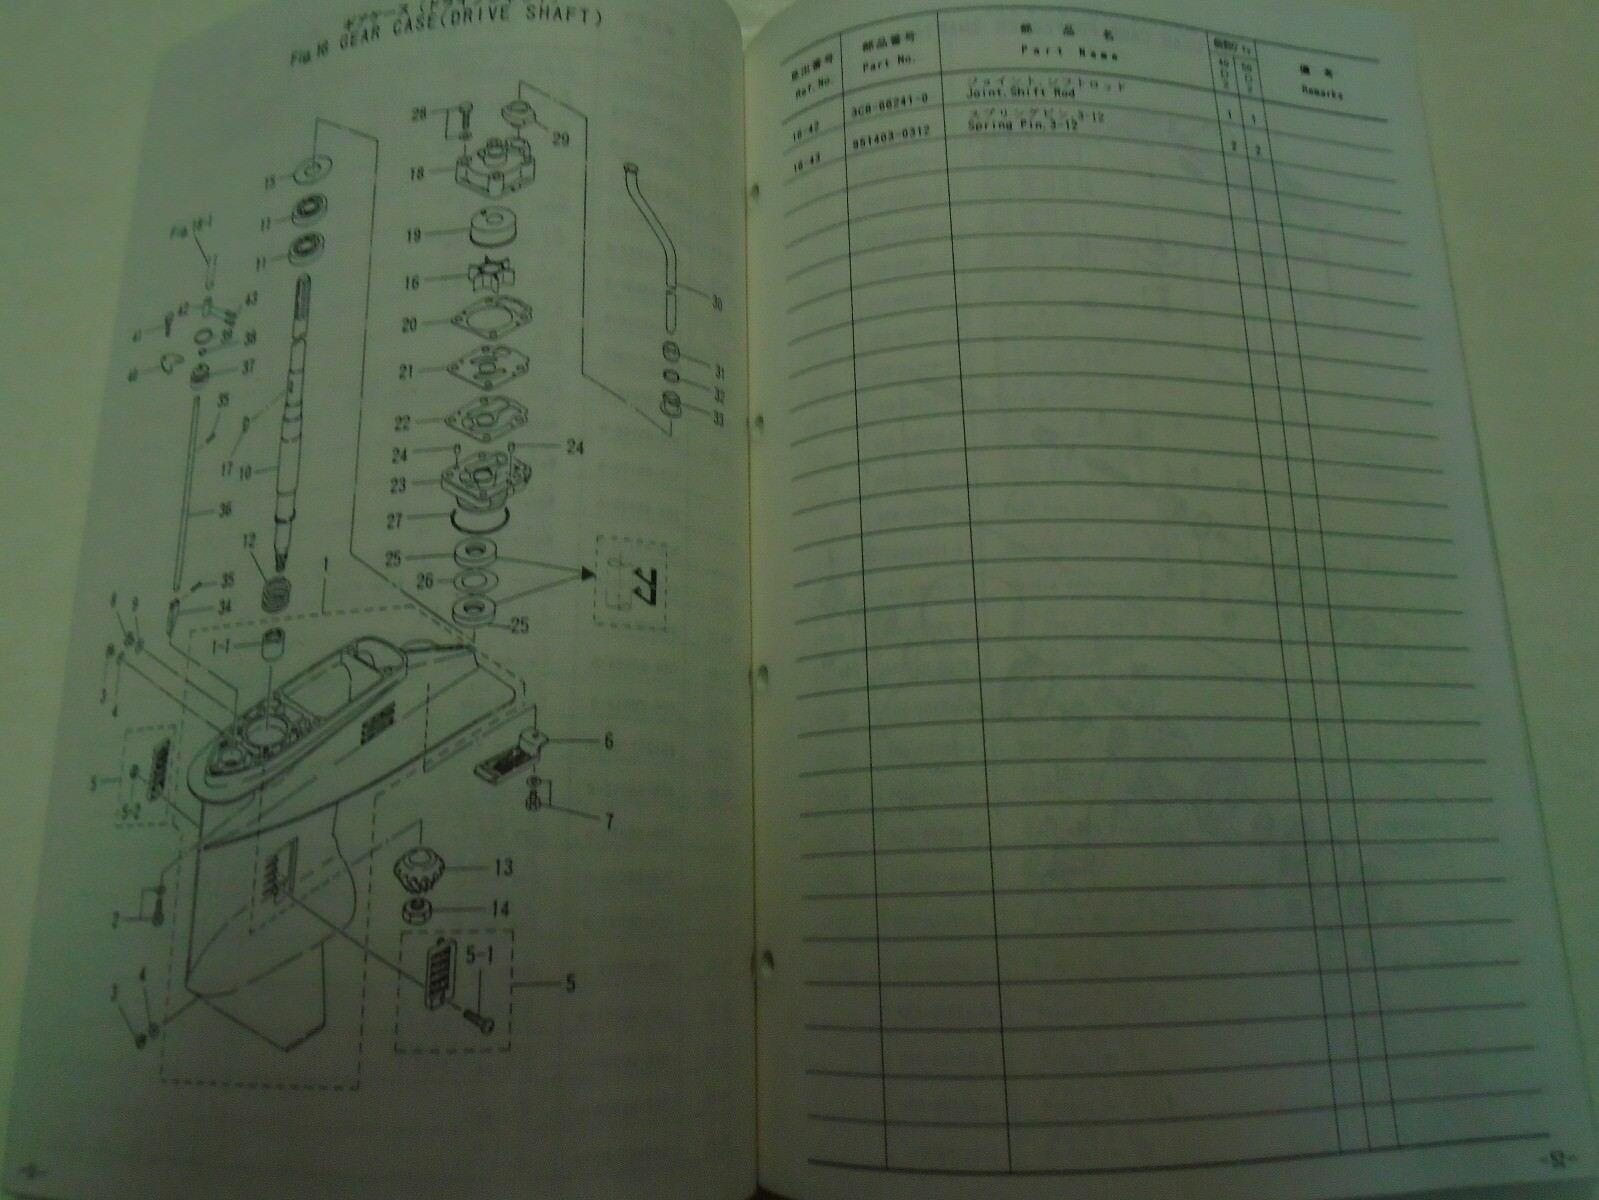 Nissan Marine Outboard Motor NS 40D2 • NS 50D2 Teile Katalog Manuell OEM image 4